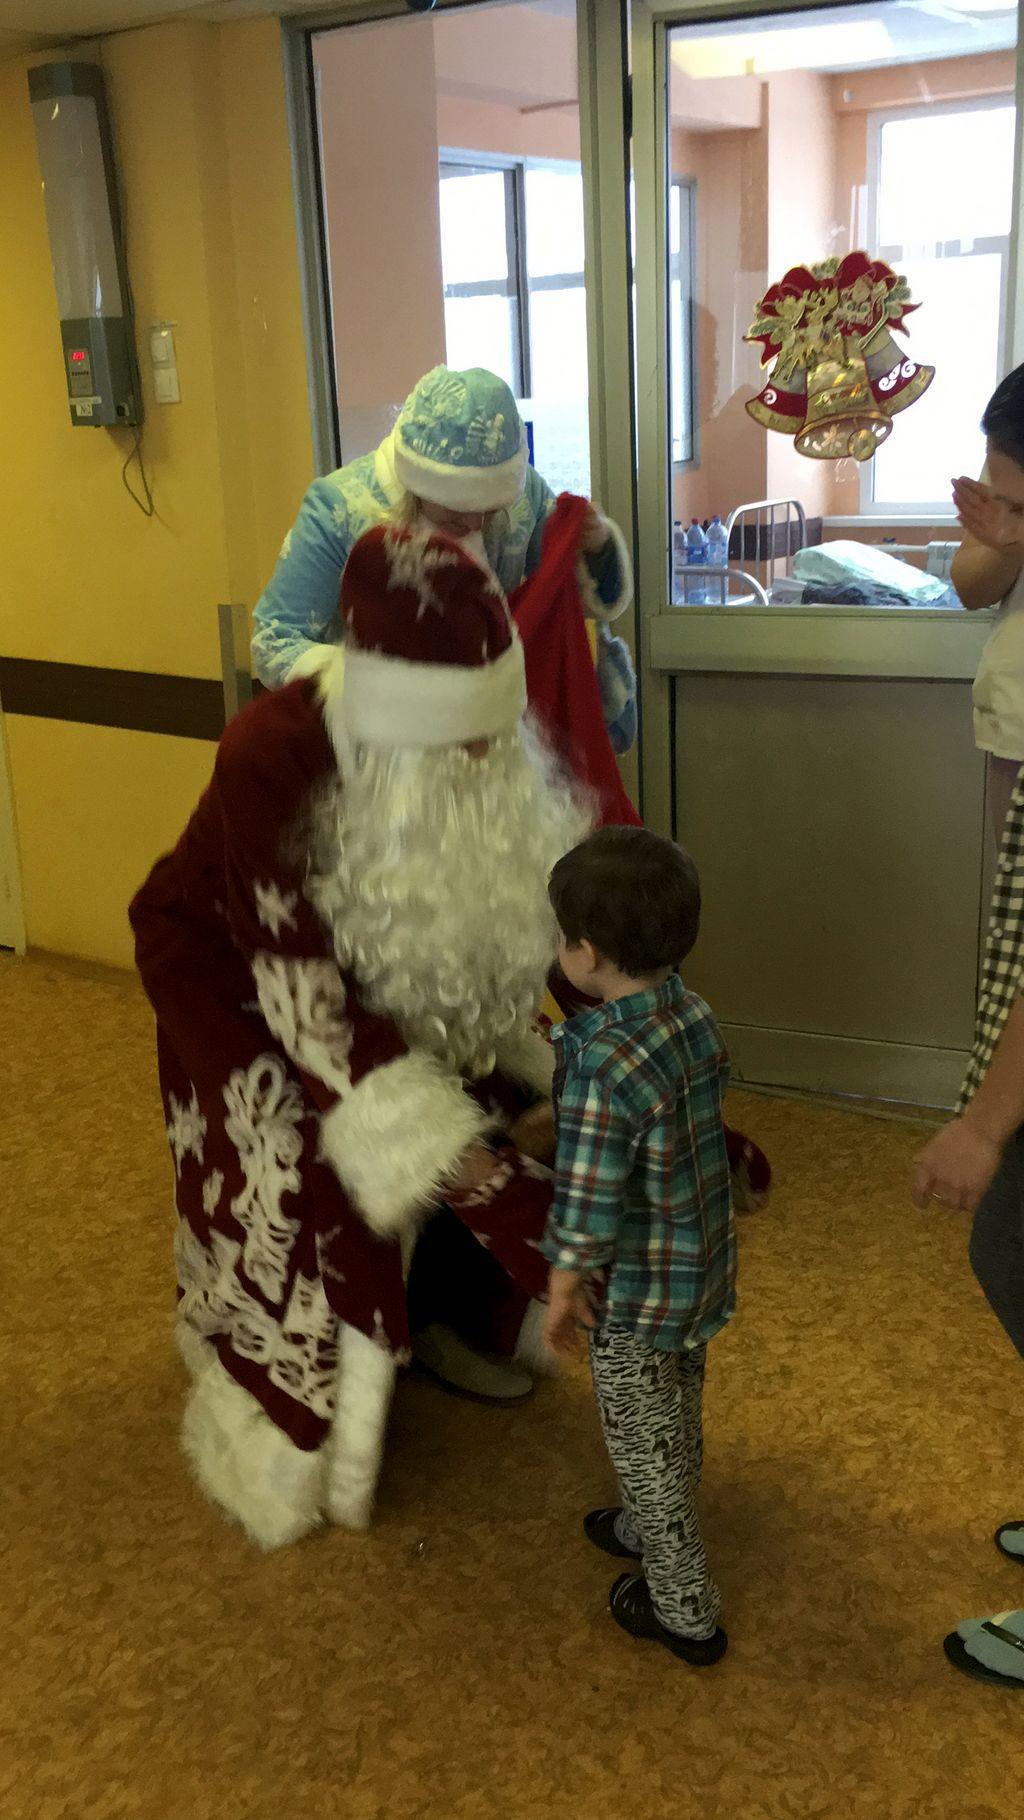 Поздравление Деда Мороза и Снегурочки Поздравление Деда Мороза и Снегурочки